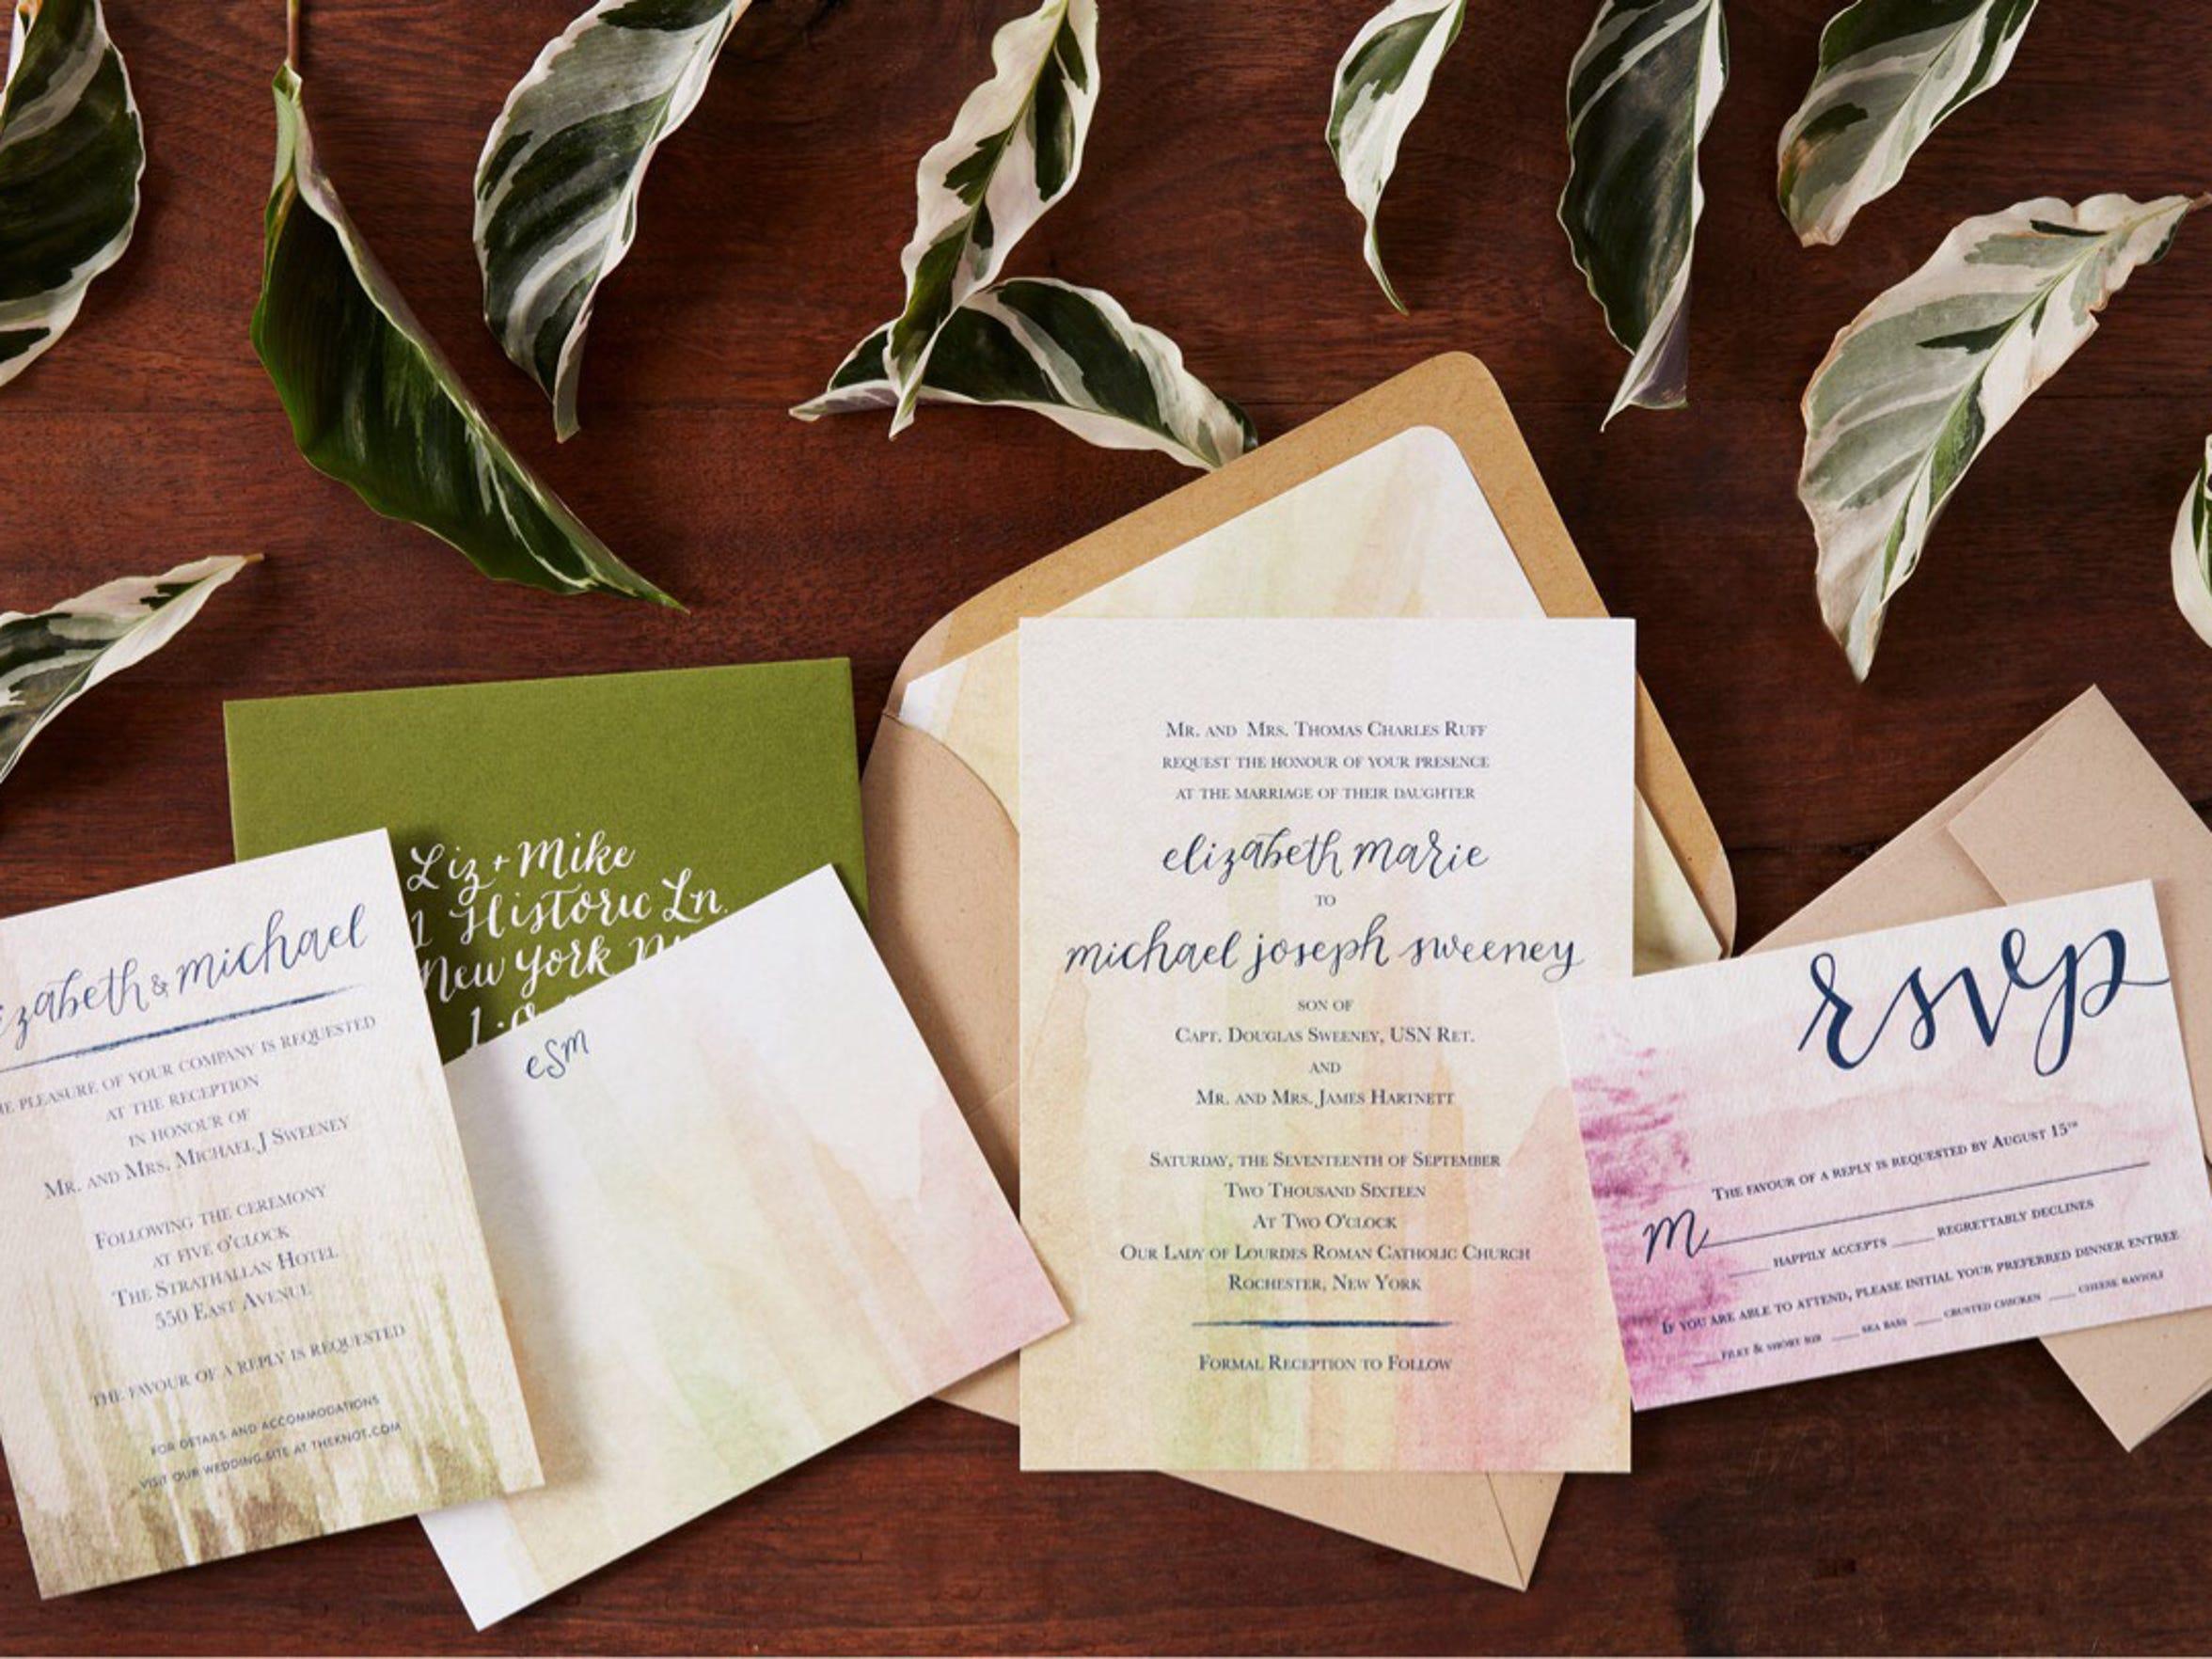 Handmade invitations: Sugar & Type